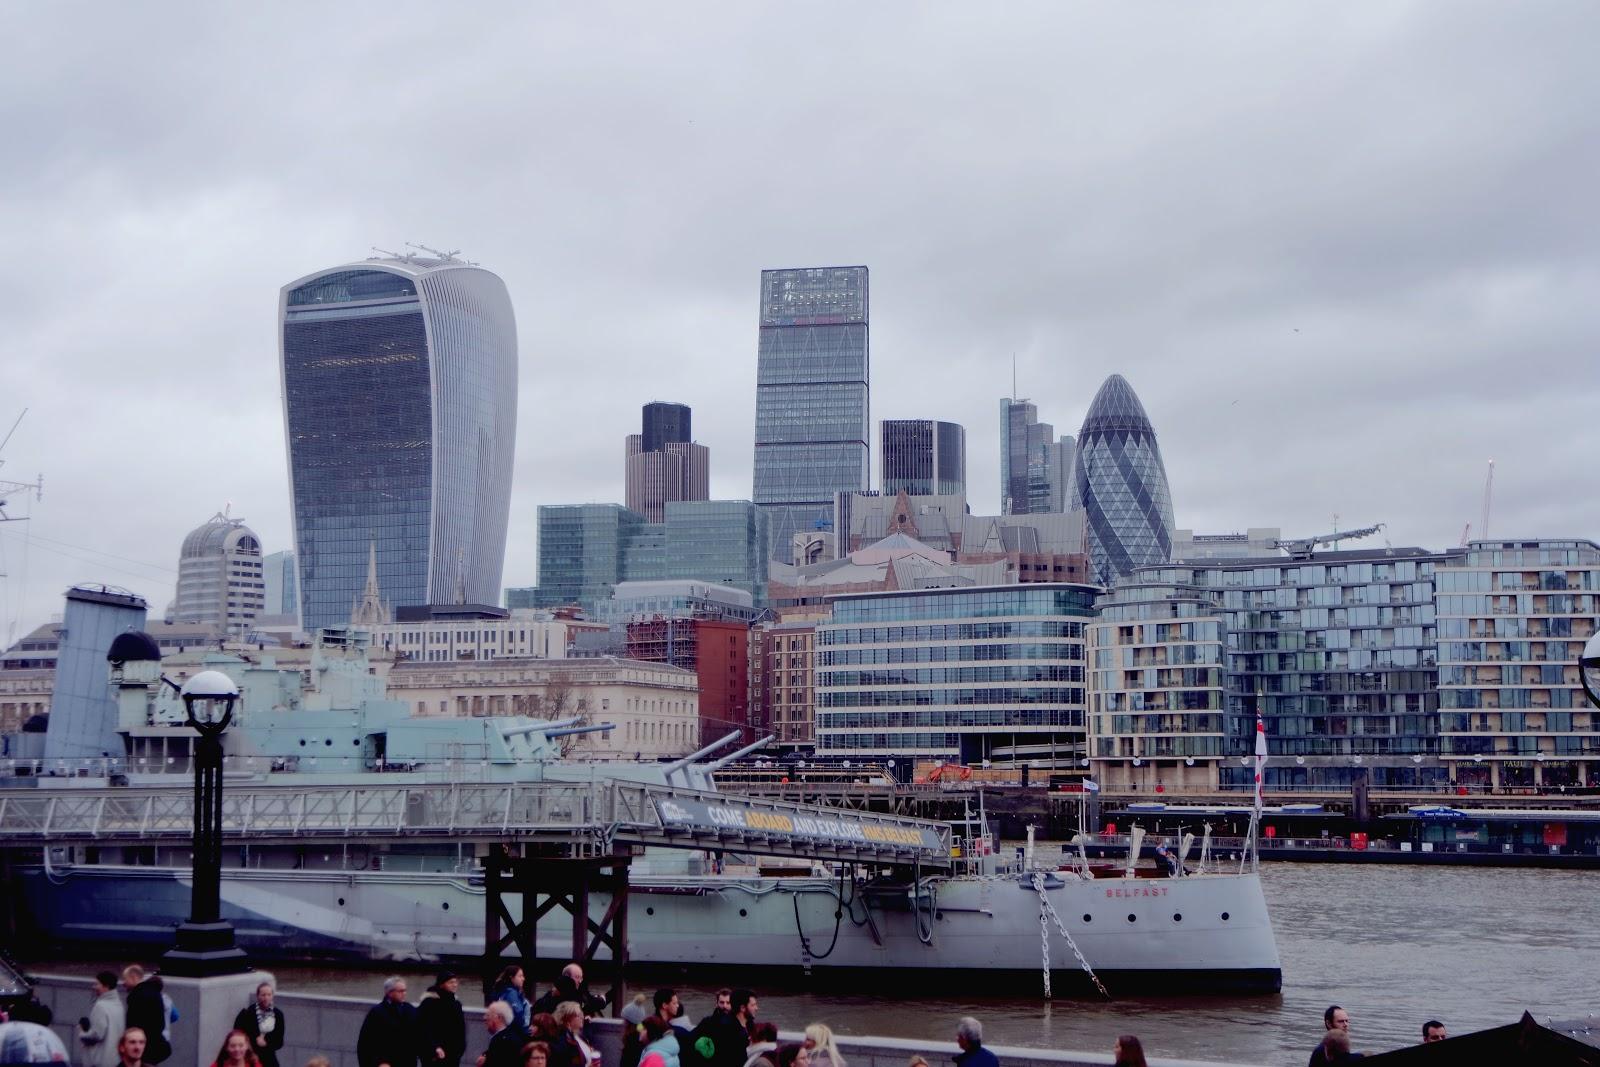 London, blog, Londres, City of London, tower bridge, London street, Thames River, Tamise,